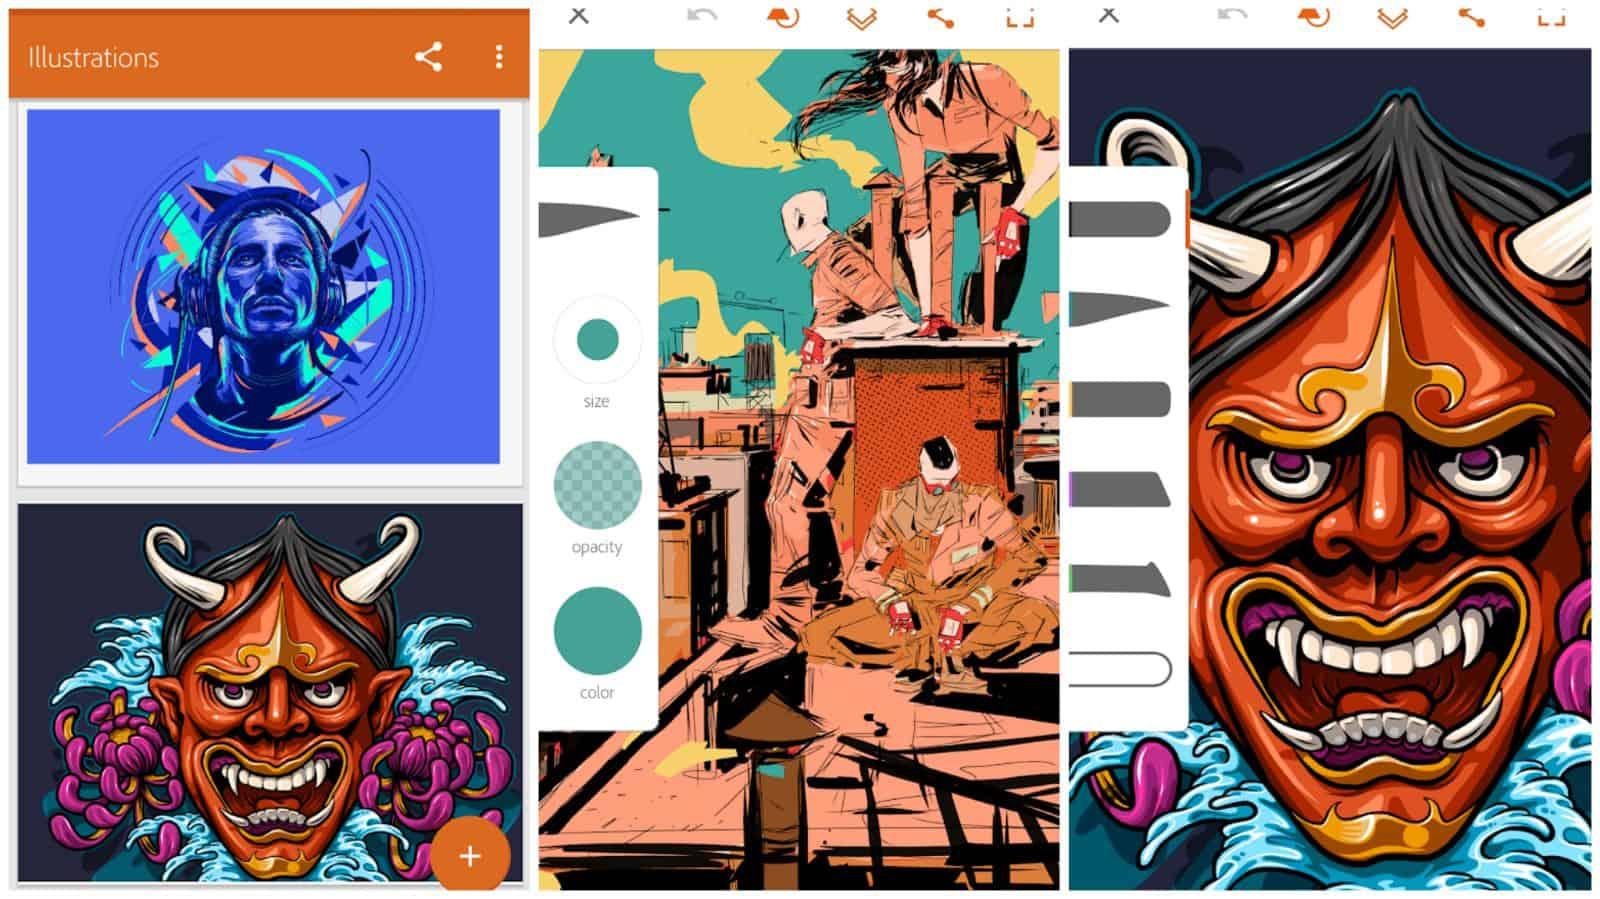 Adobe Illustrator app grid image